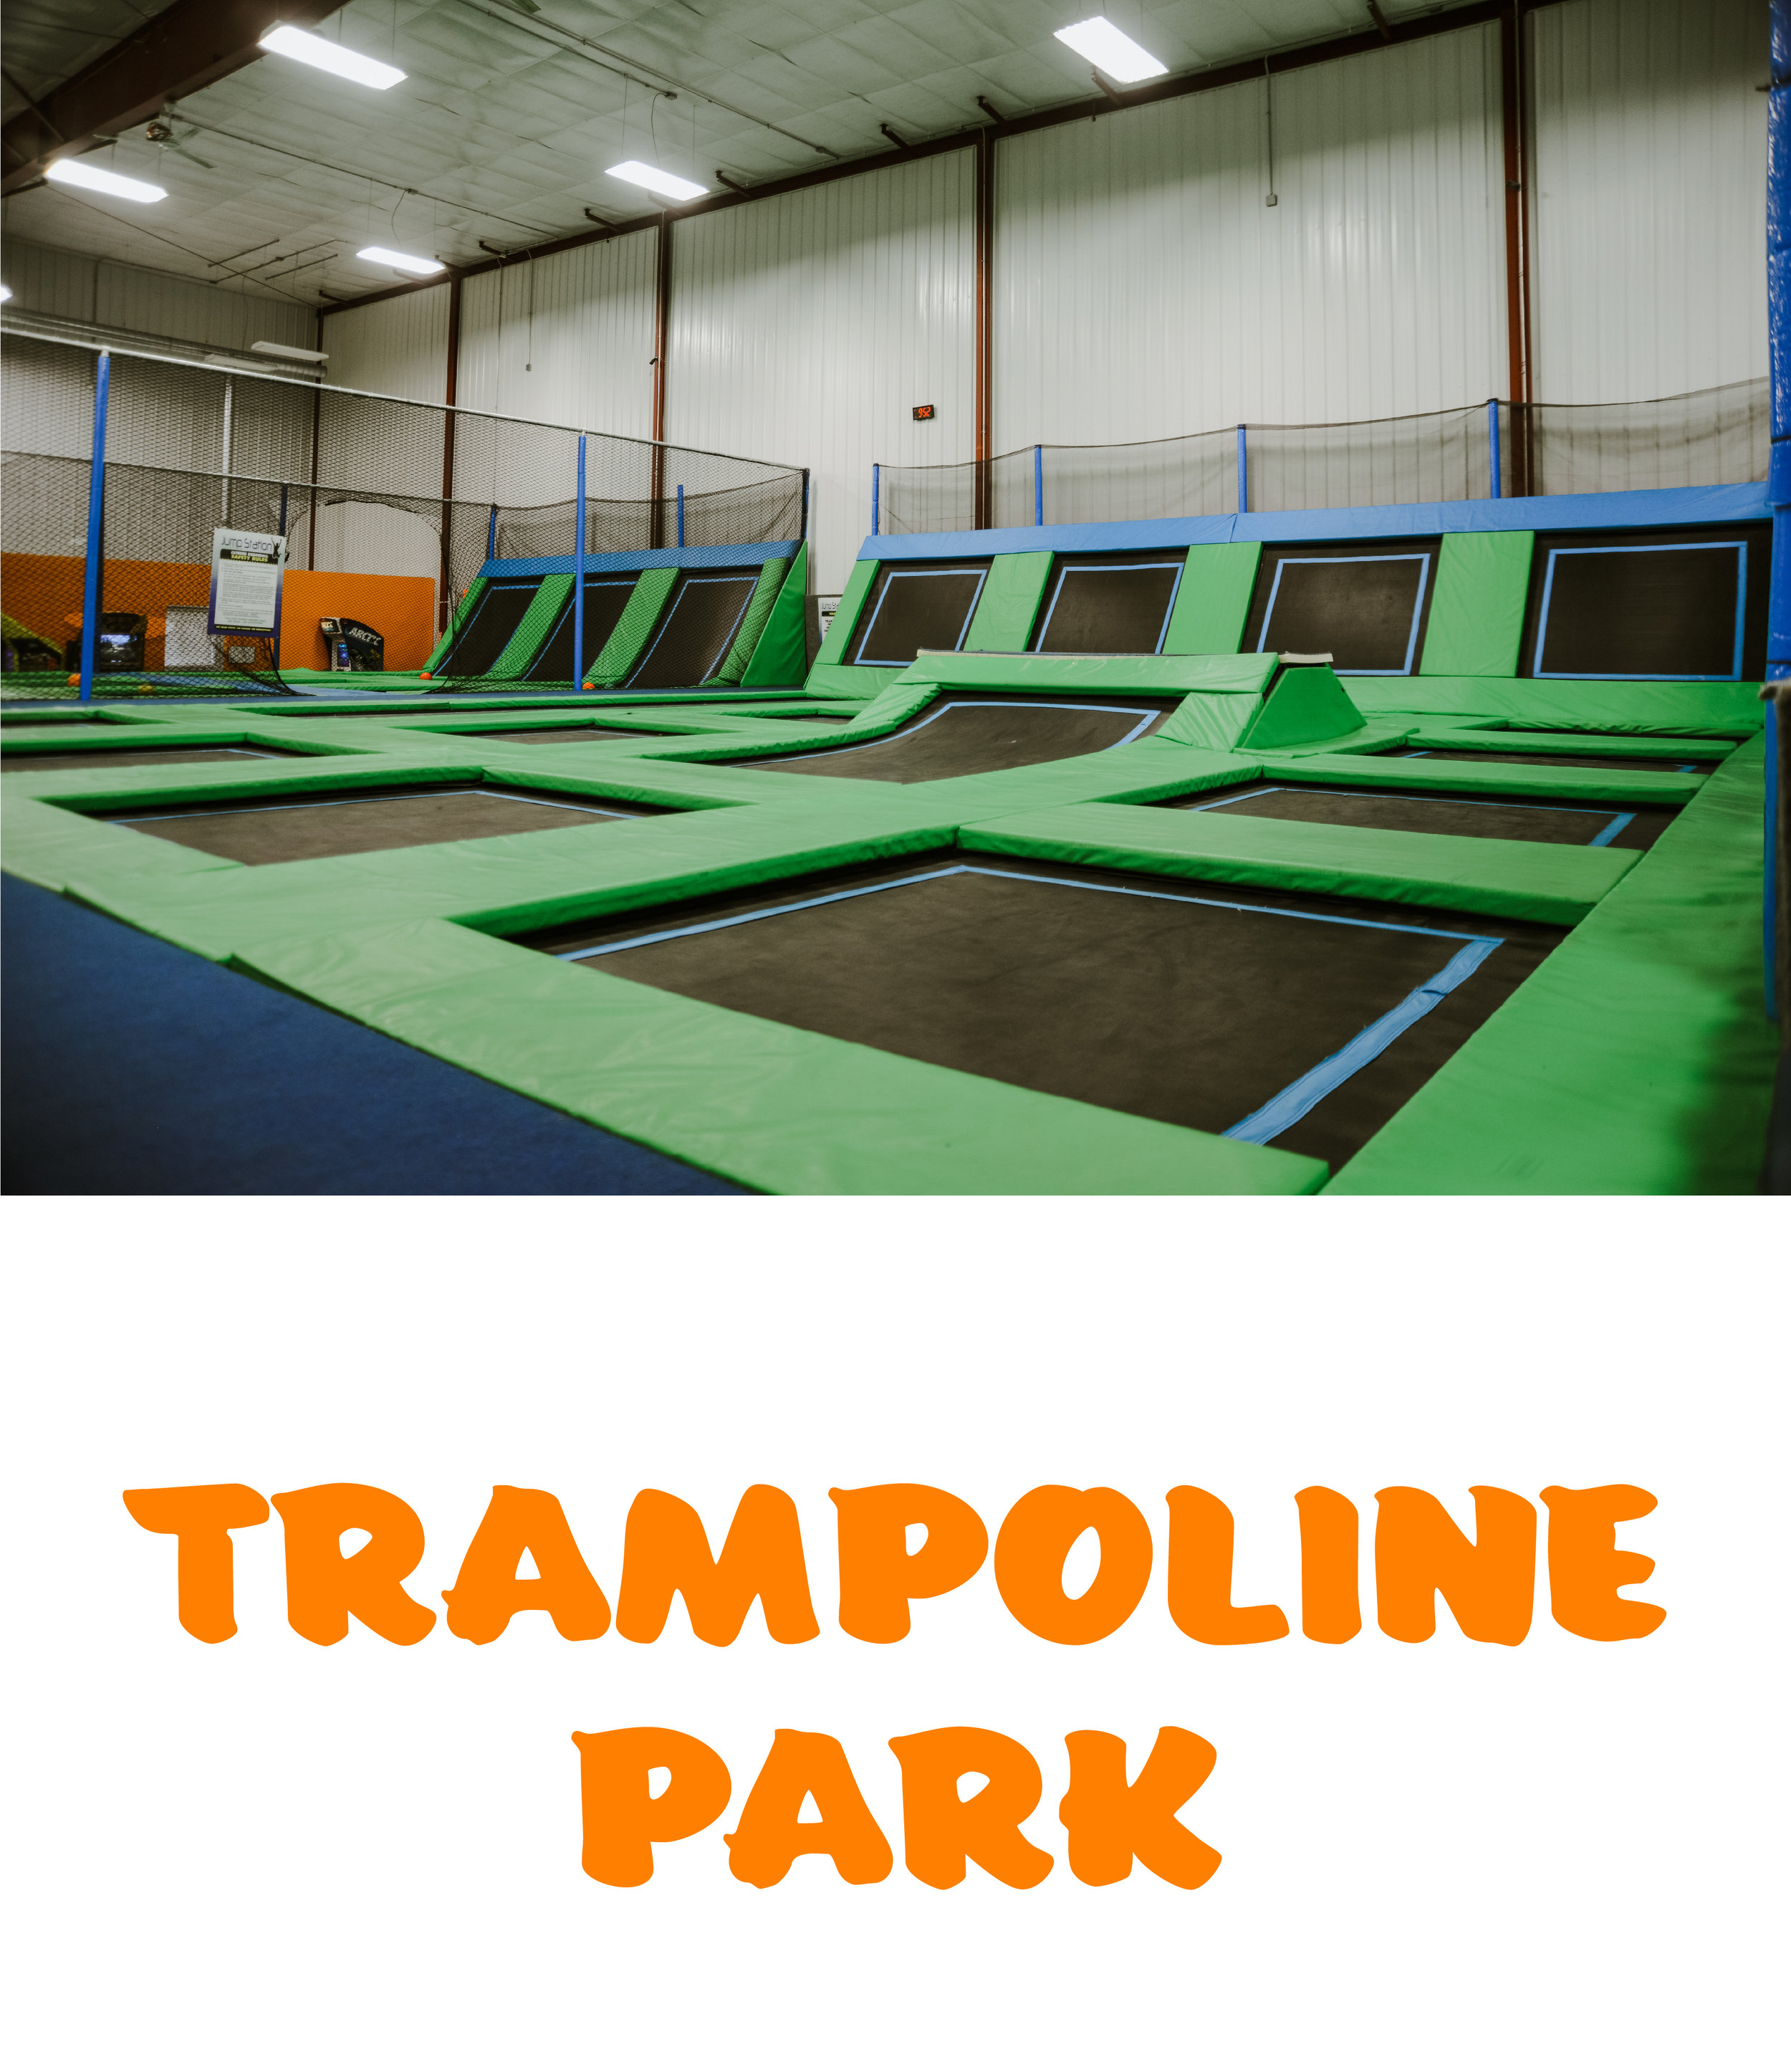 Trampoline Park Prices.jpg